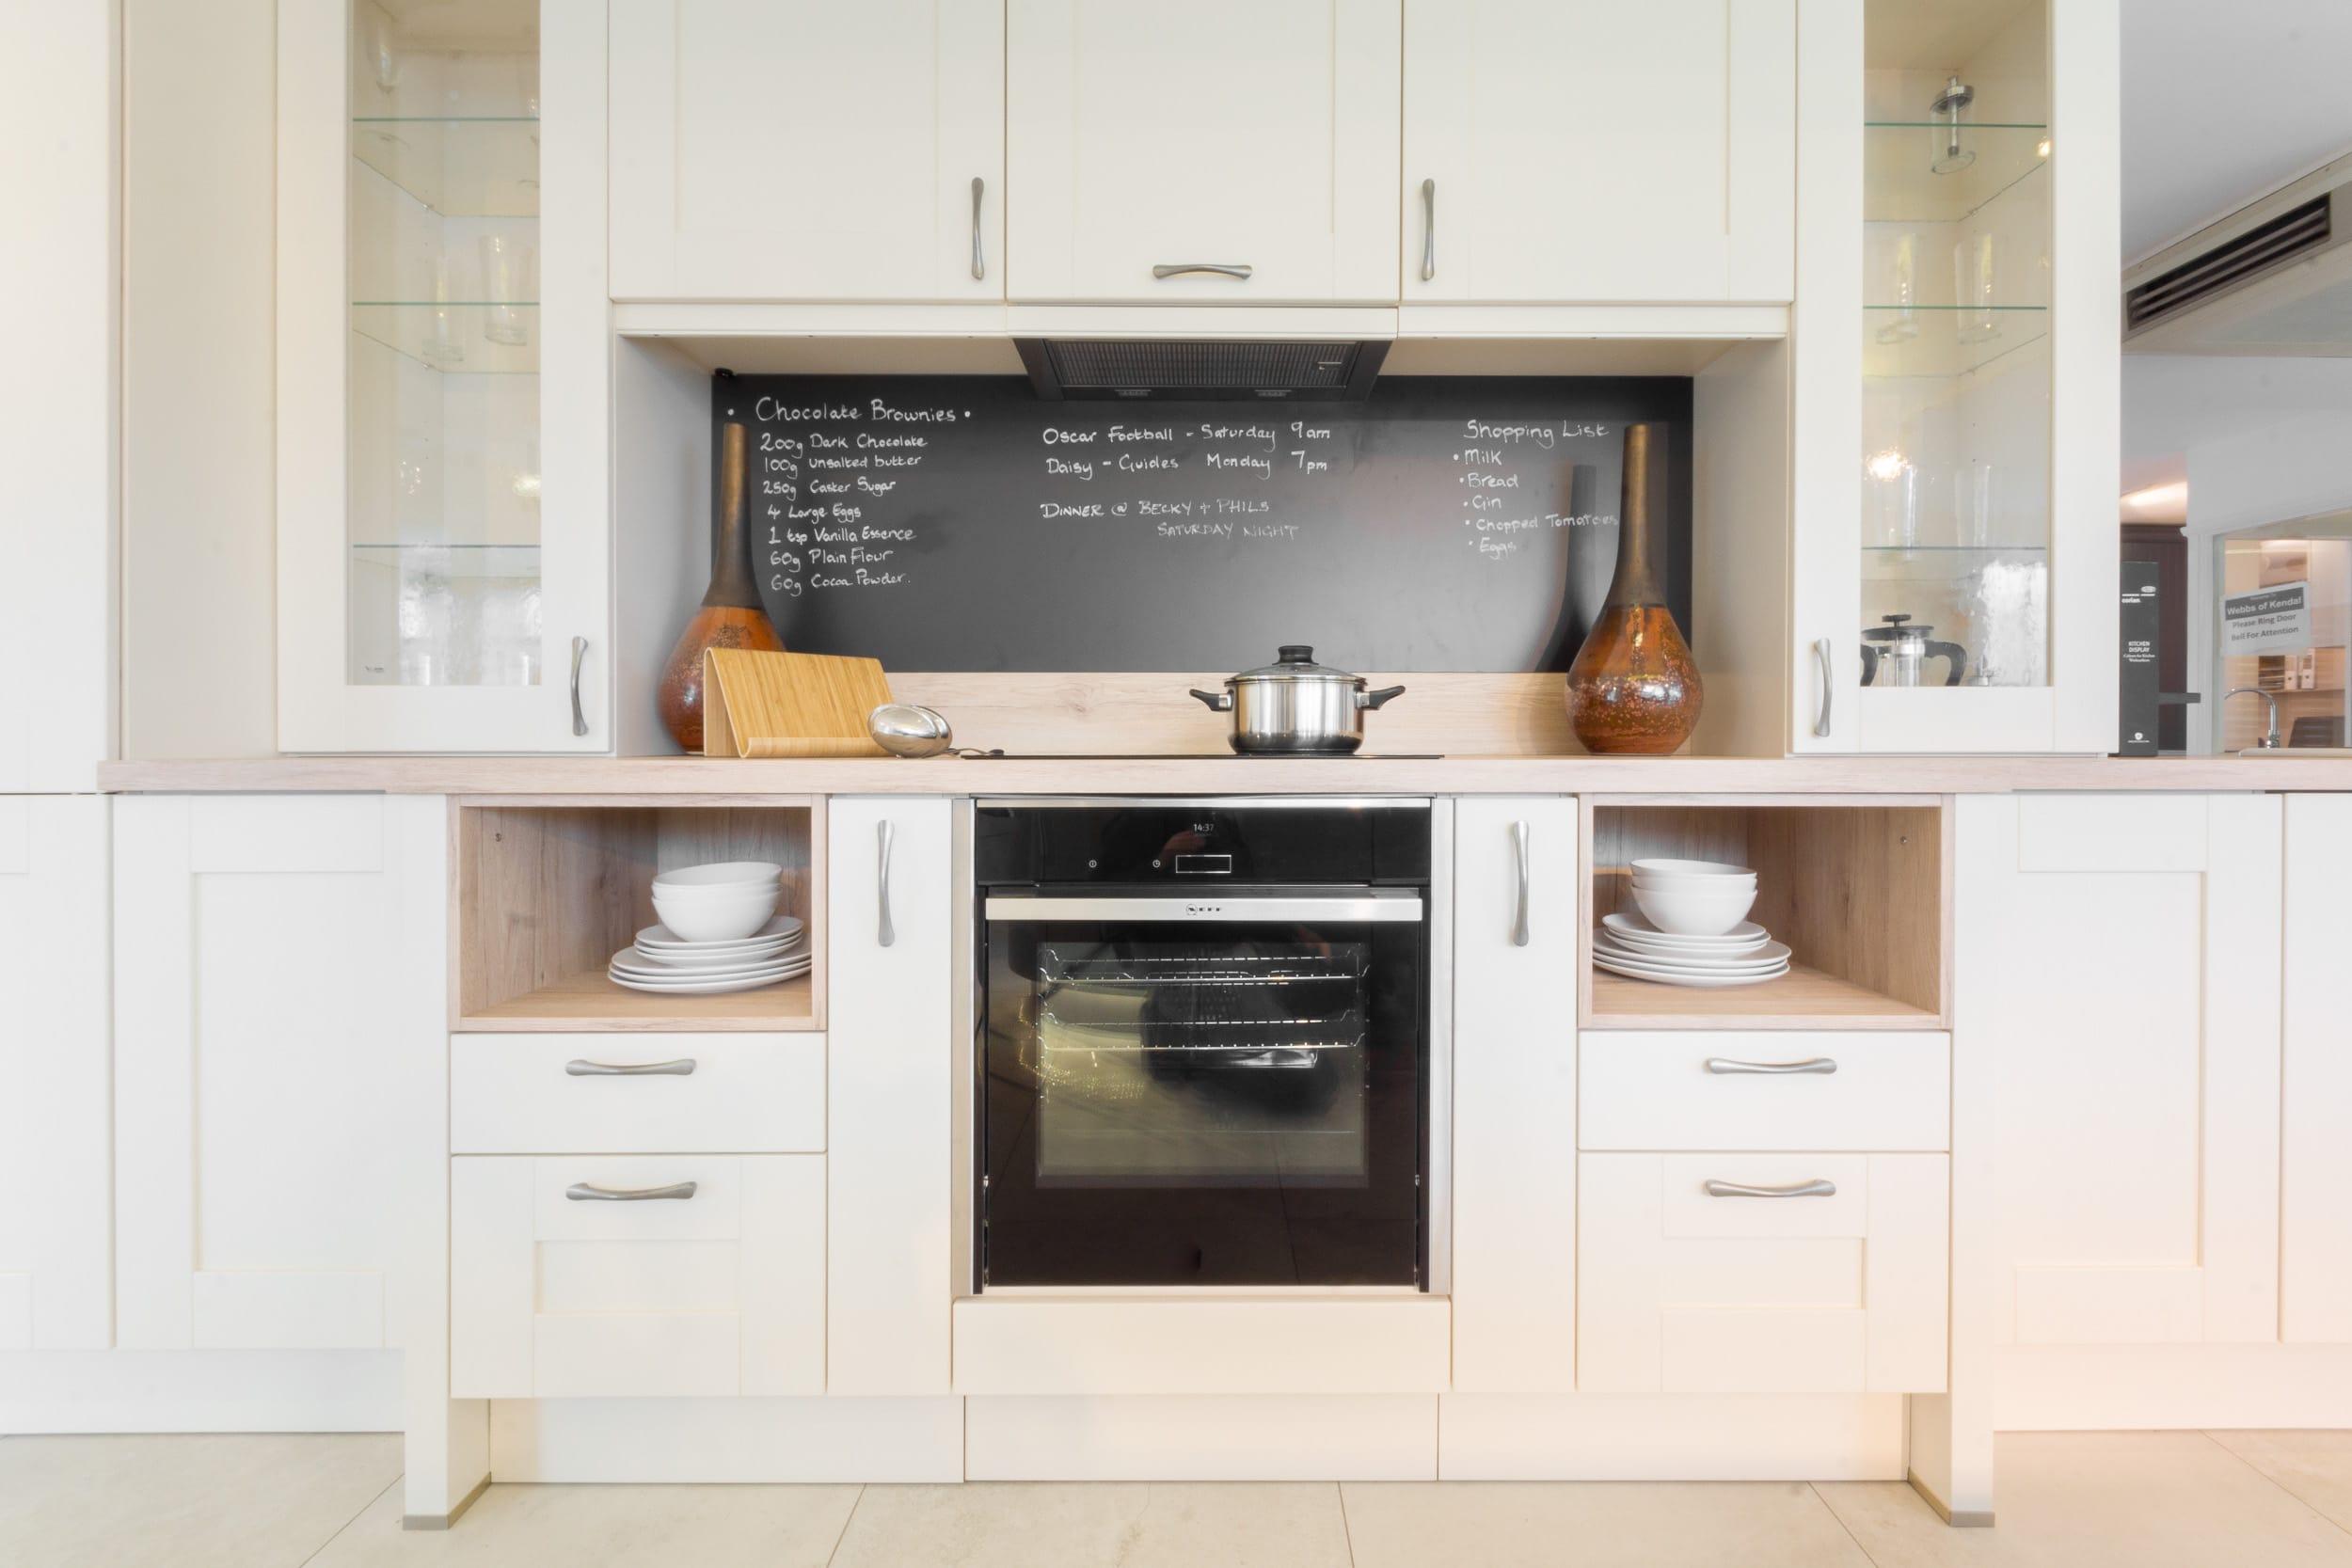 Kitchen-Showroom-Webbs-Kendal-24.jpg